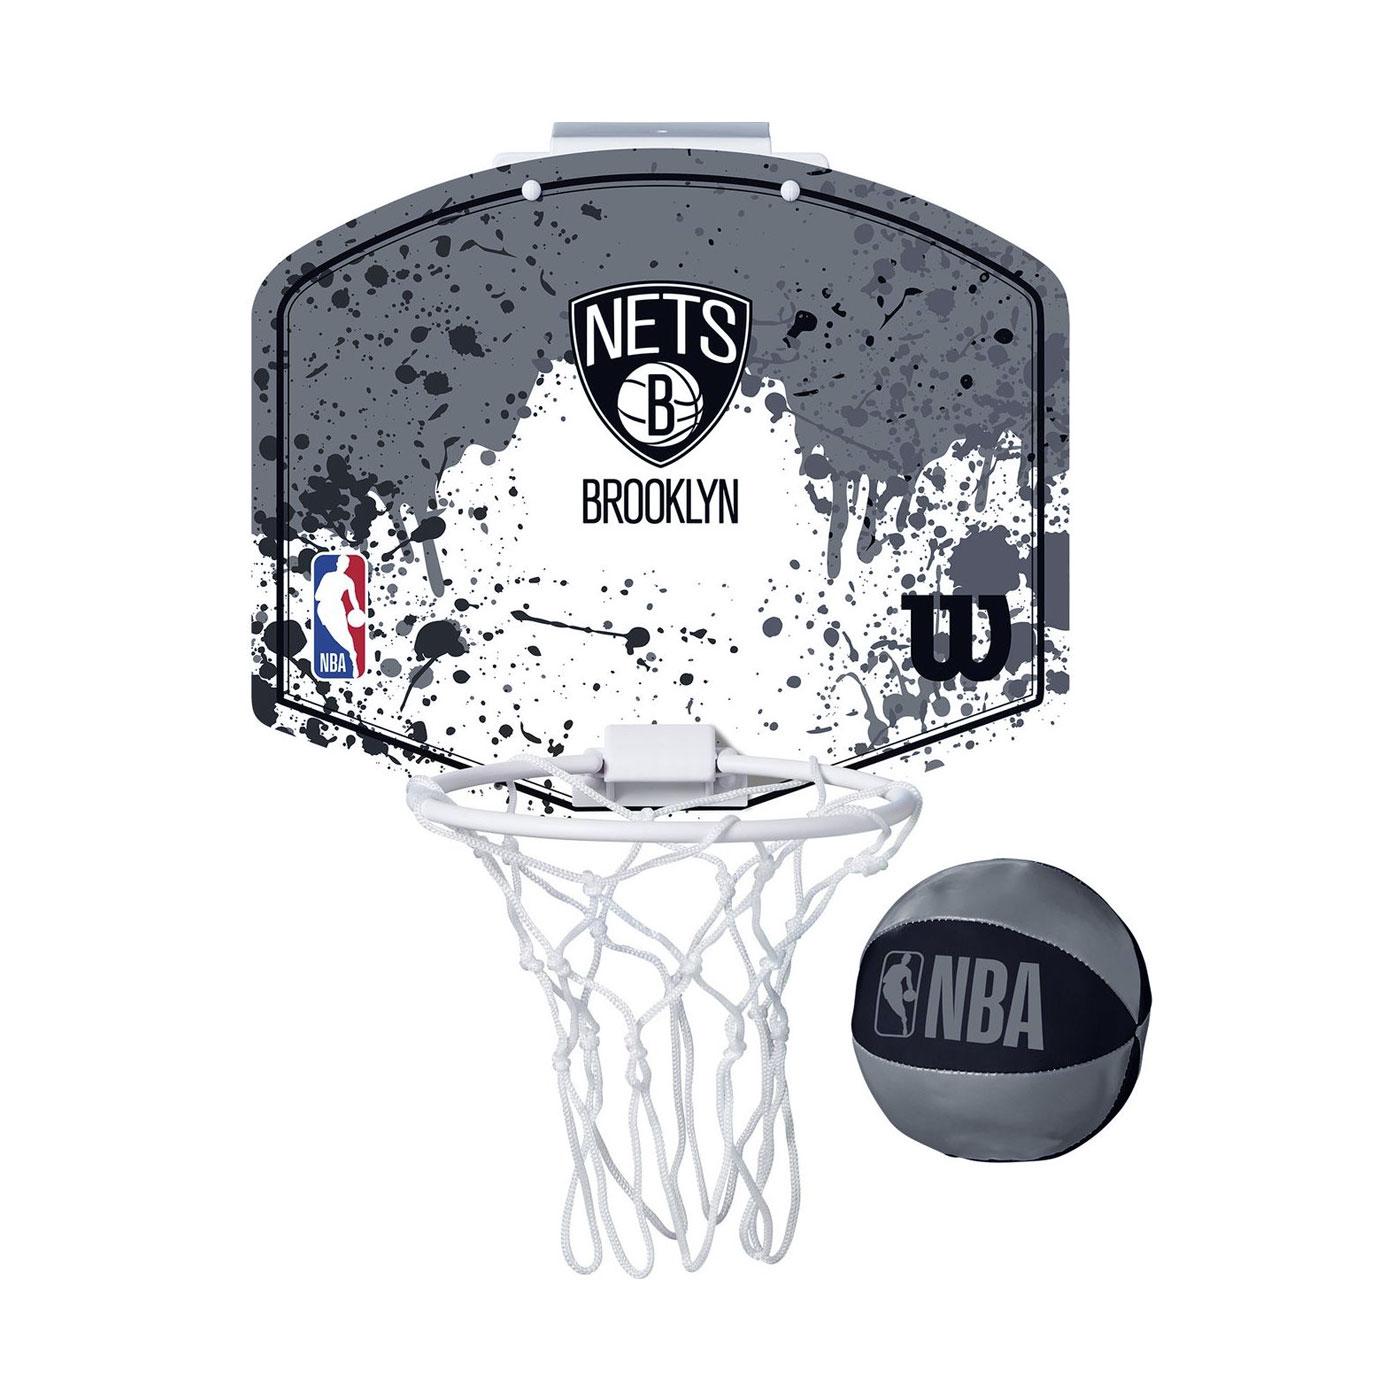 WILSON NBA 迷你籃板 21'籃網隊(含小球) WTBA1302BRO - 灰白黑